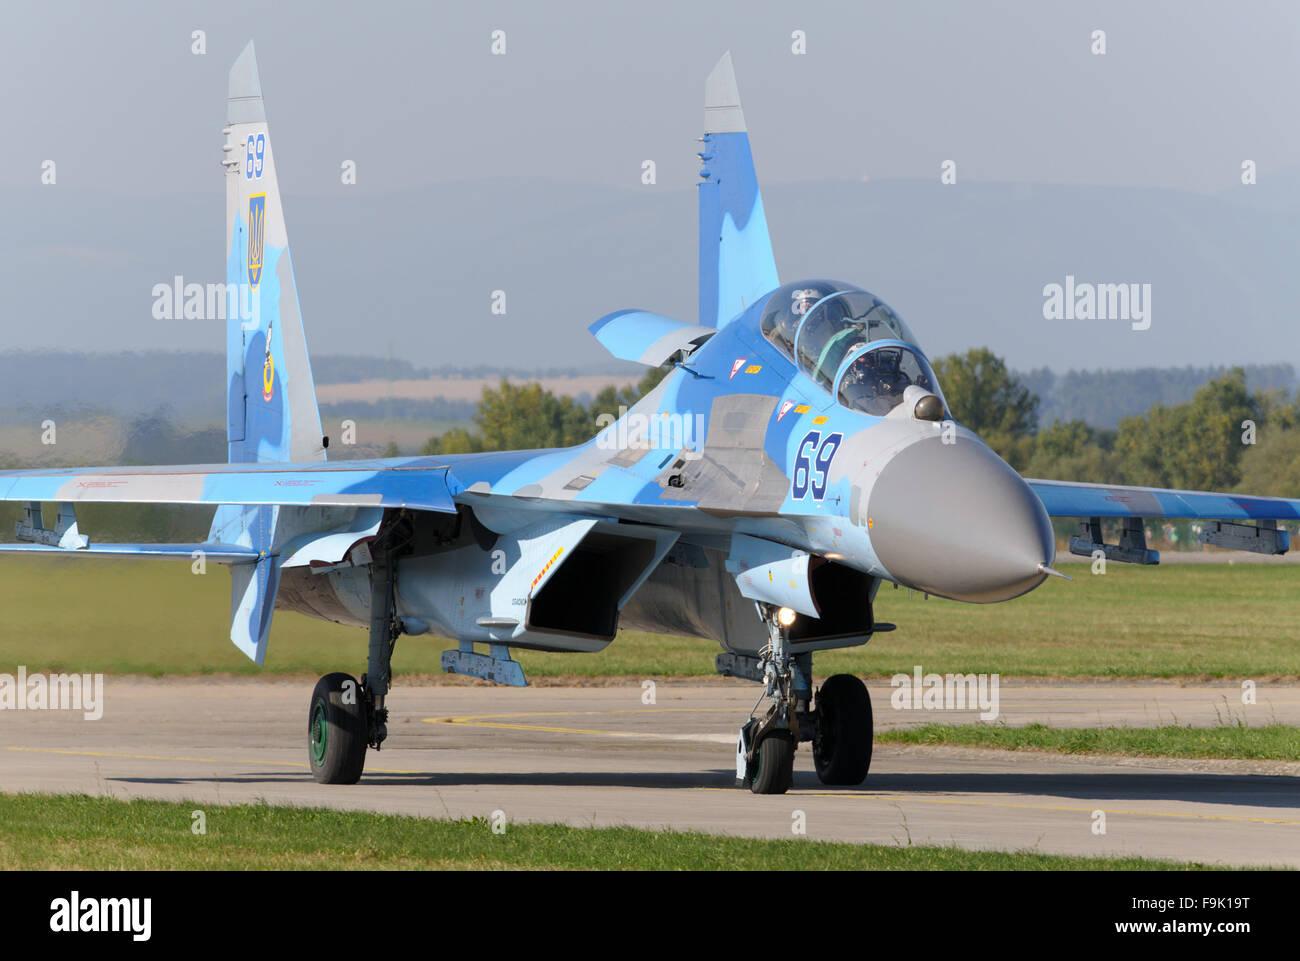 Ukraine Air Force Sukhoi Su-27 Stock Photo